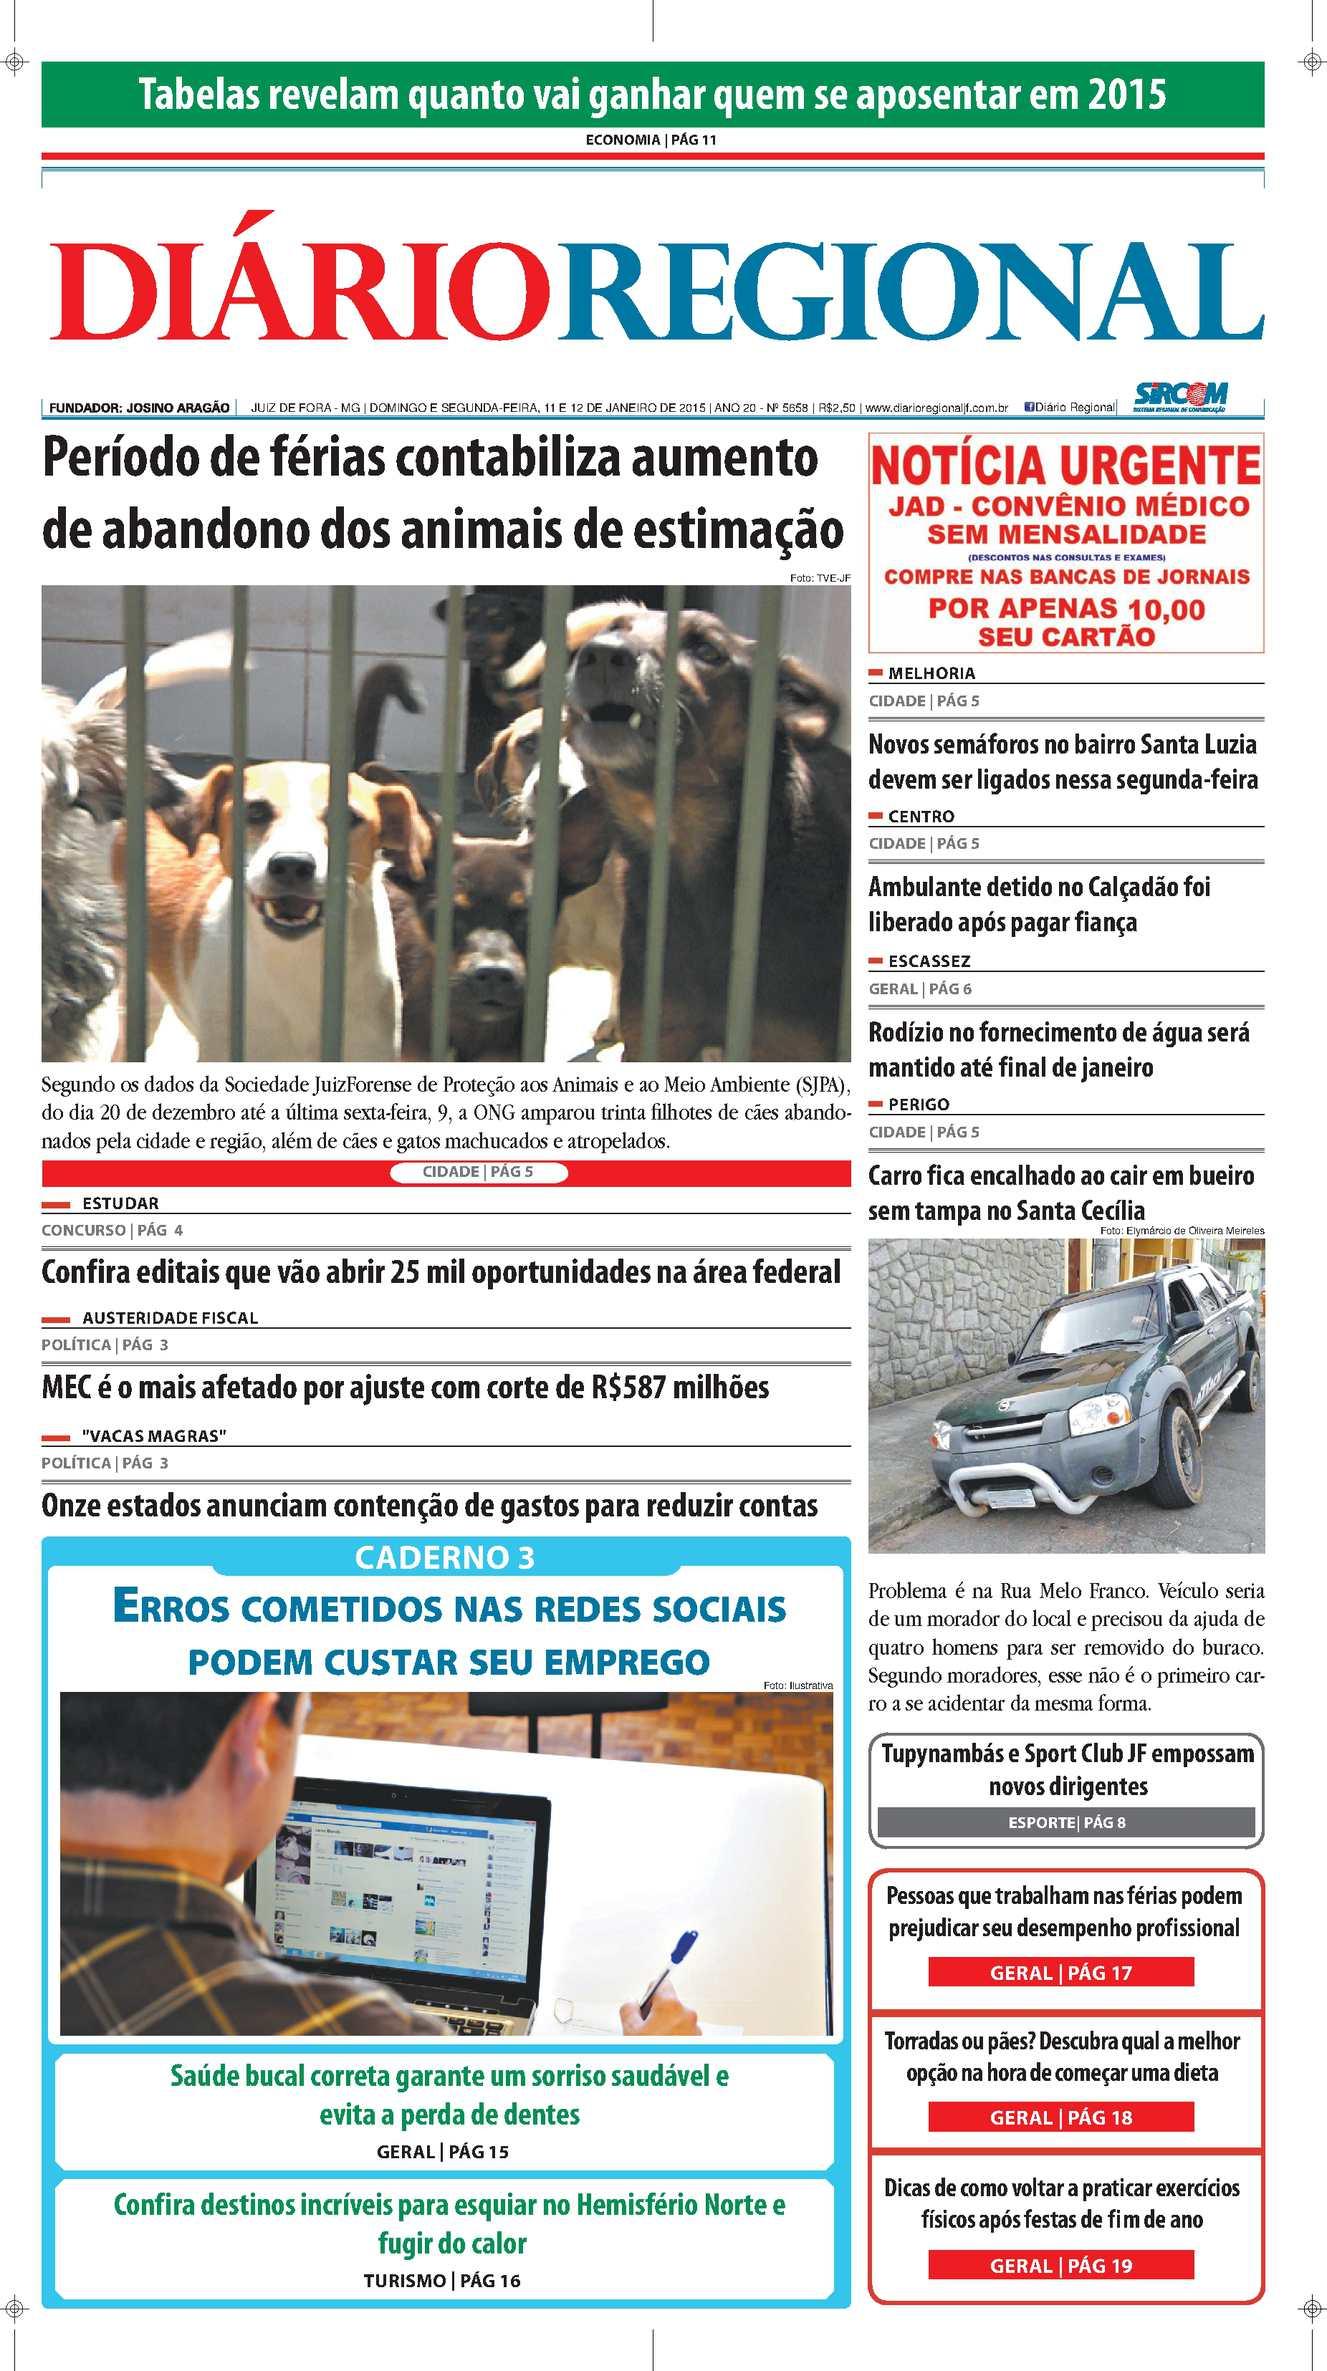 Calaméo - Jornal Site 11 1 15 e7f6621990